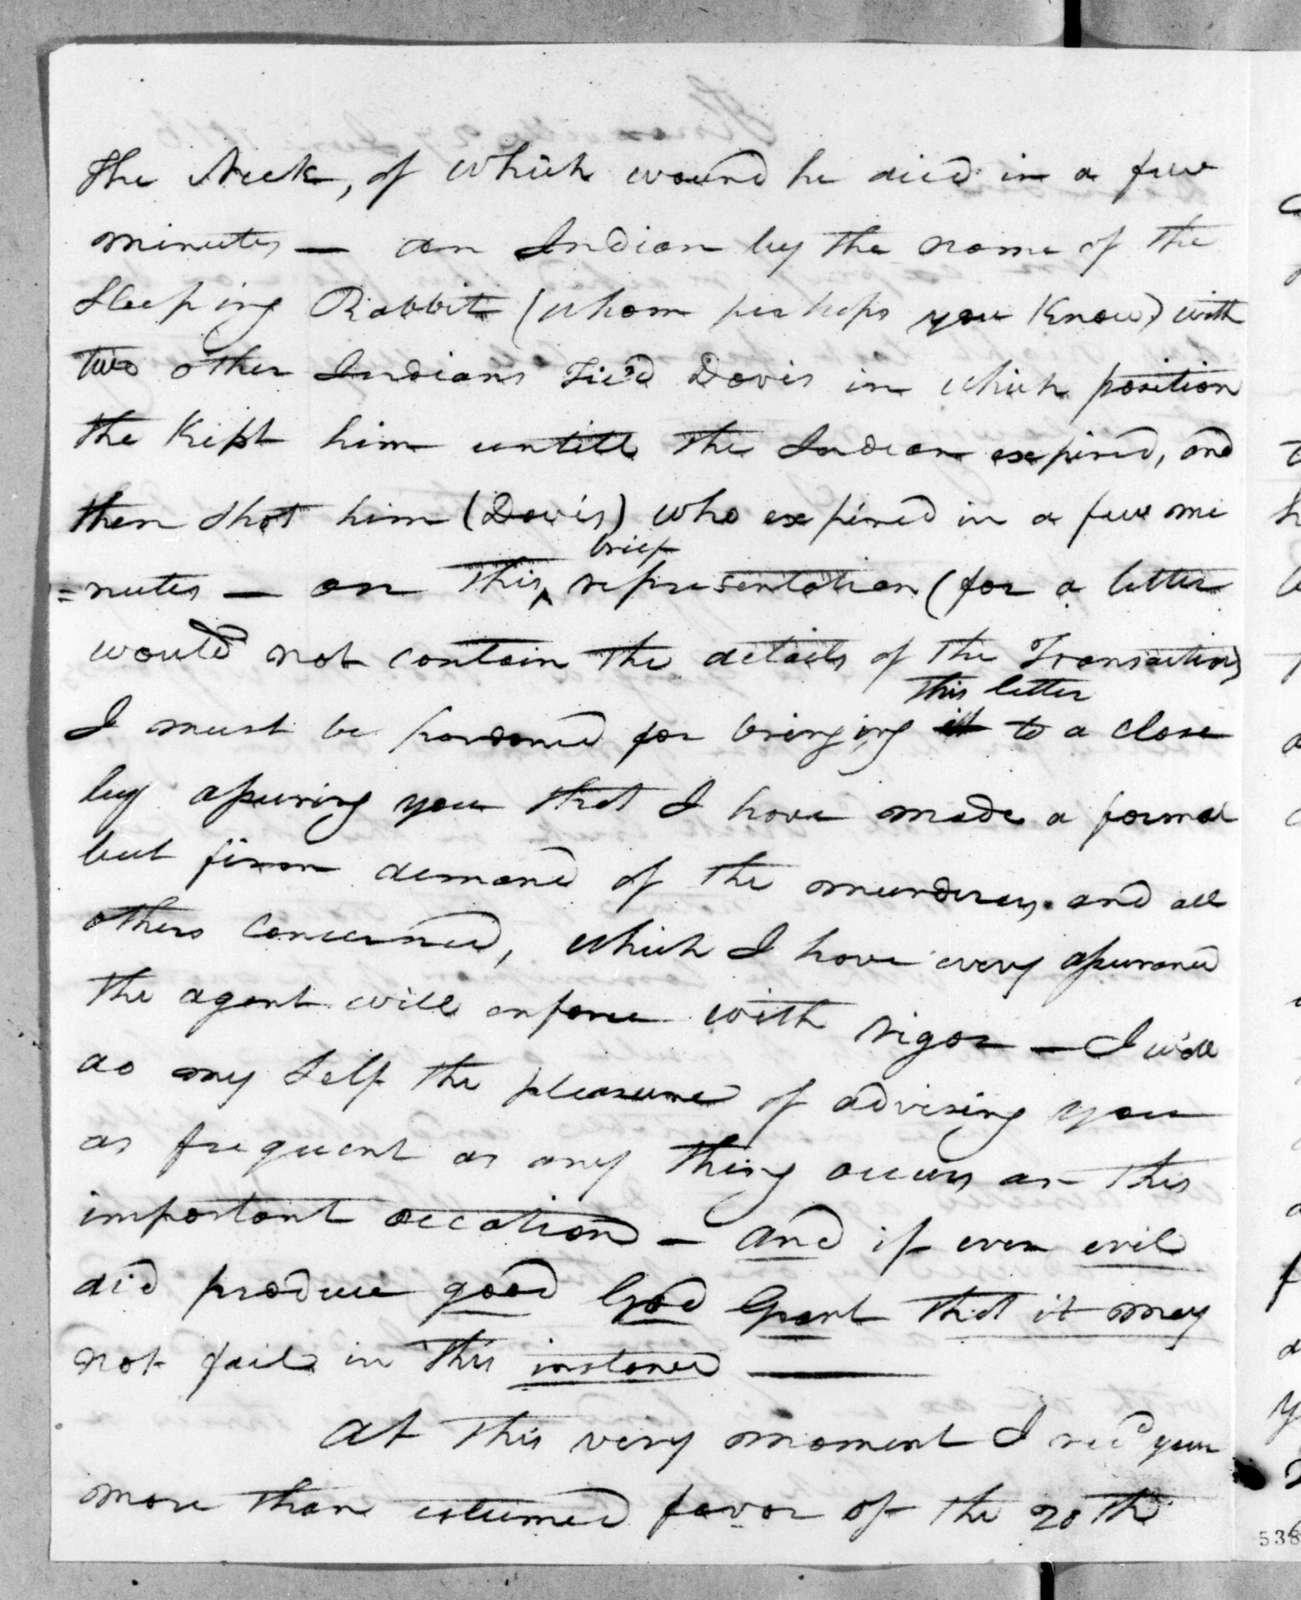 Joseph McMinn to Andrew Jackson, June 27, 1816